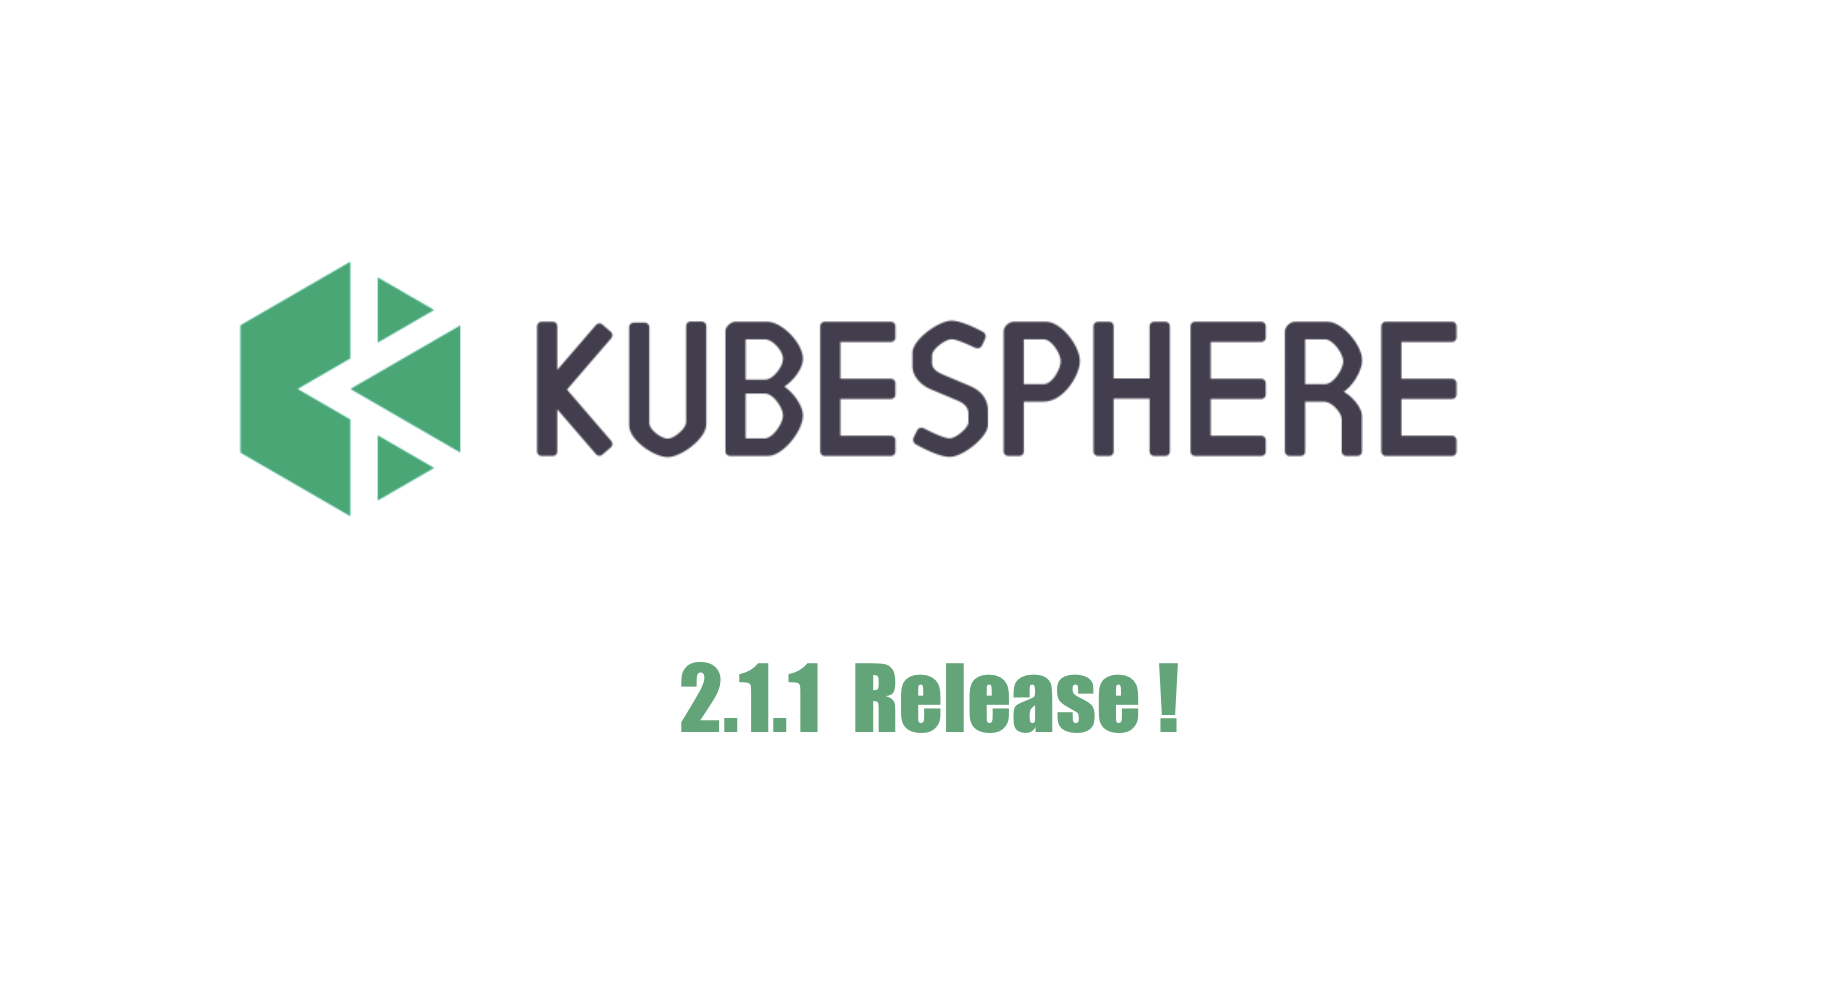 KubeSphere 容器平台发布 2.1.1,全面支持 Kubernetes 1.17